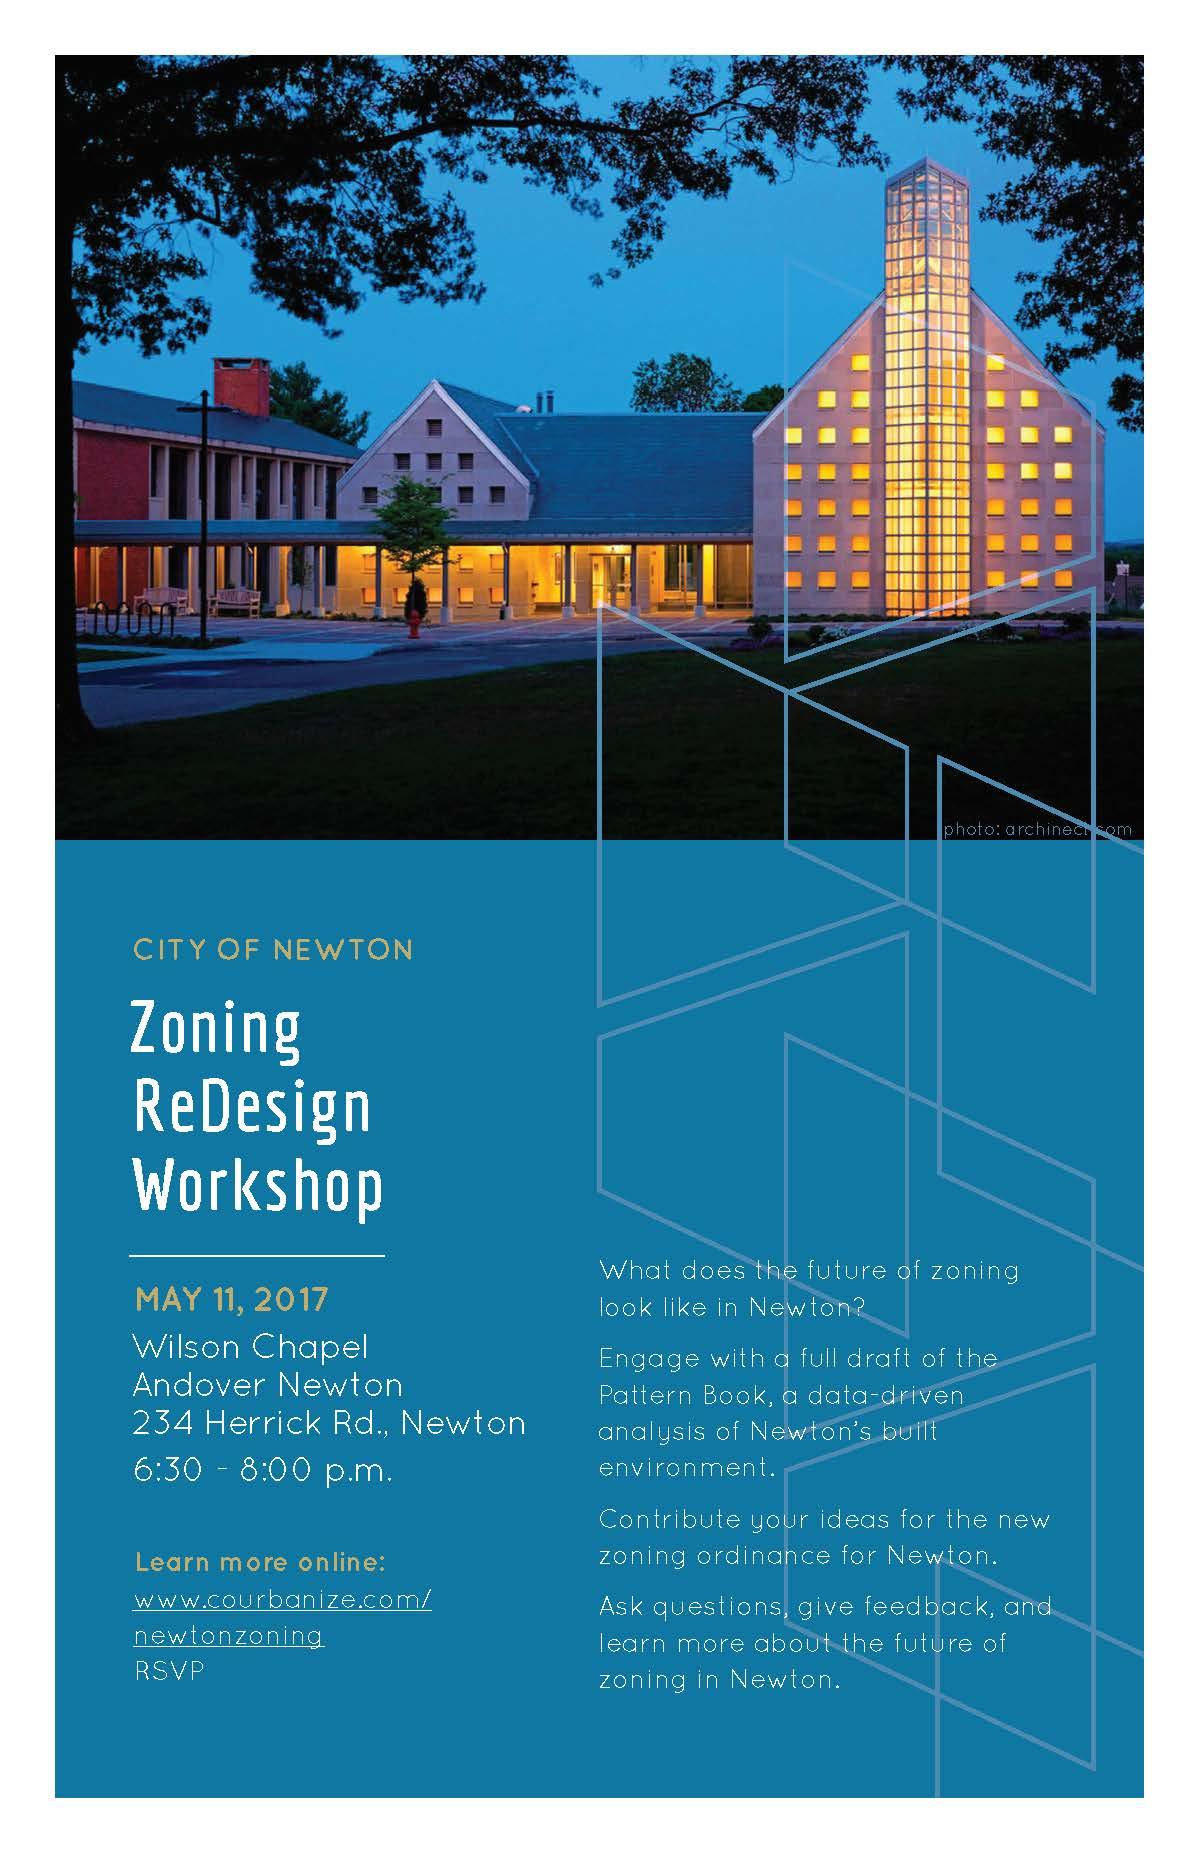 Zoning Redesign Workshop event poster